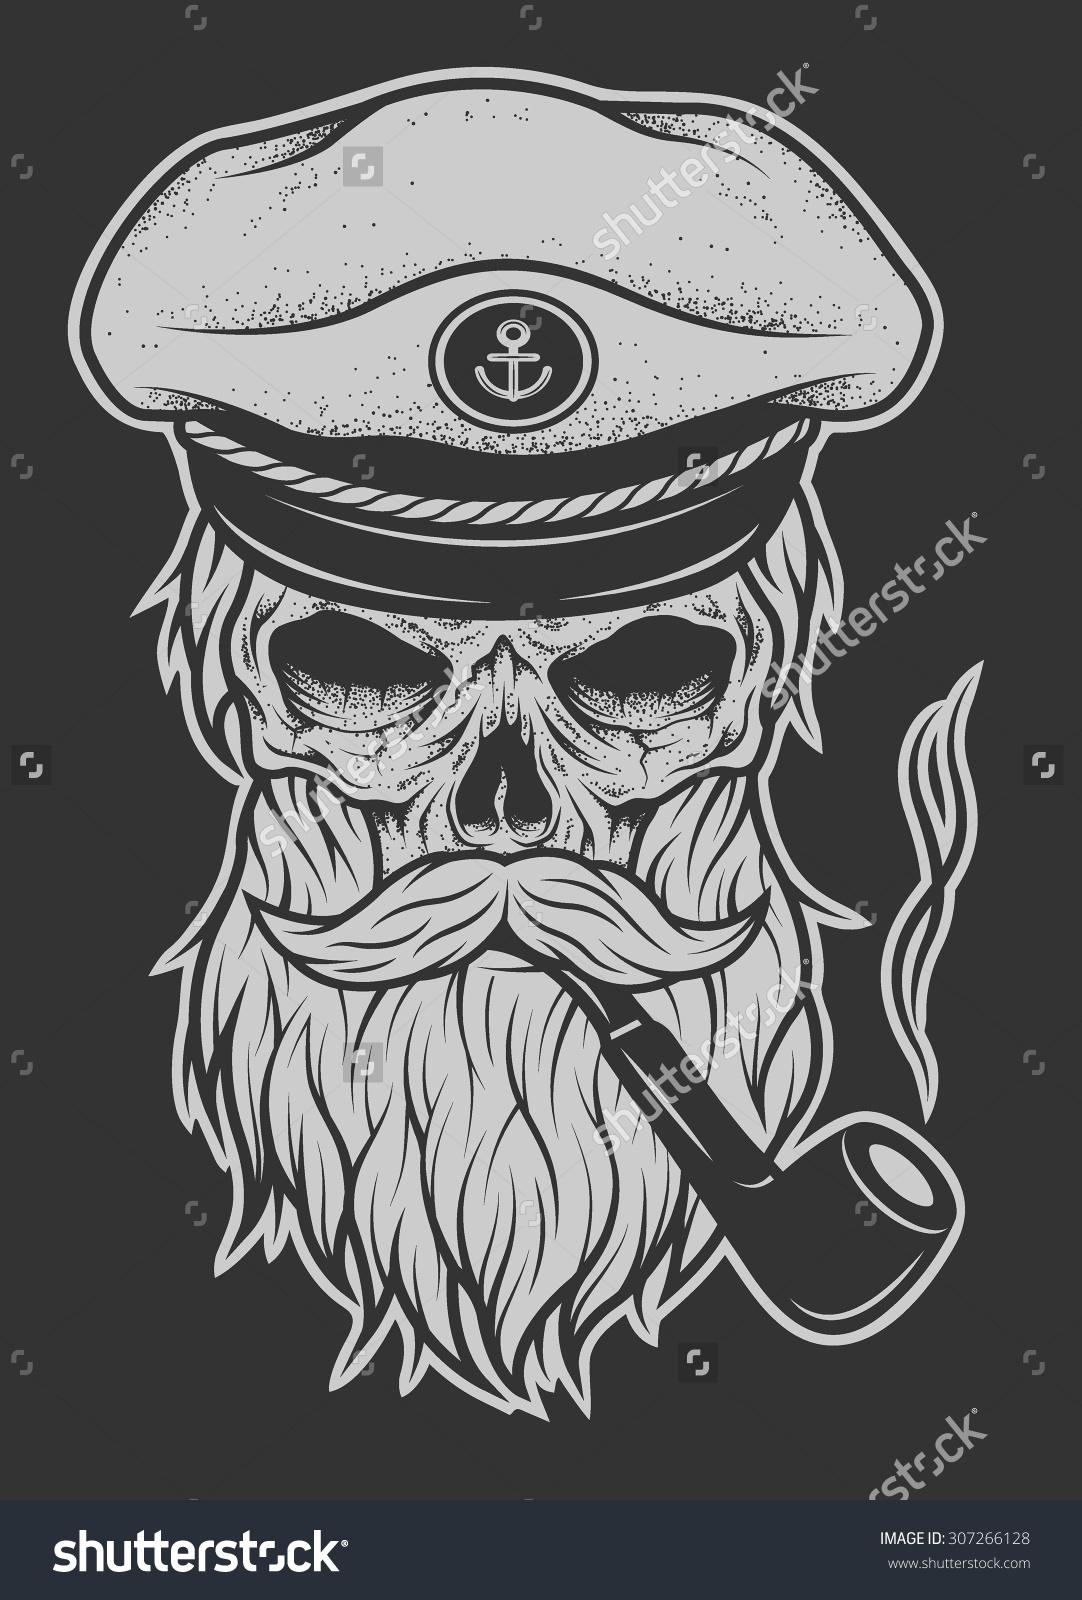 Drawn pirate beard Skull  with sailor Projeto